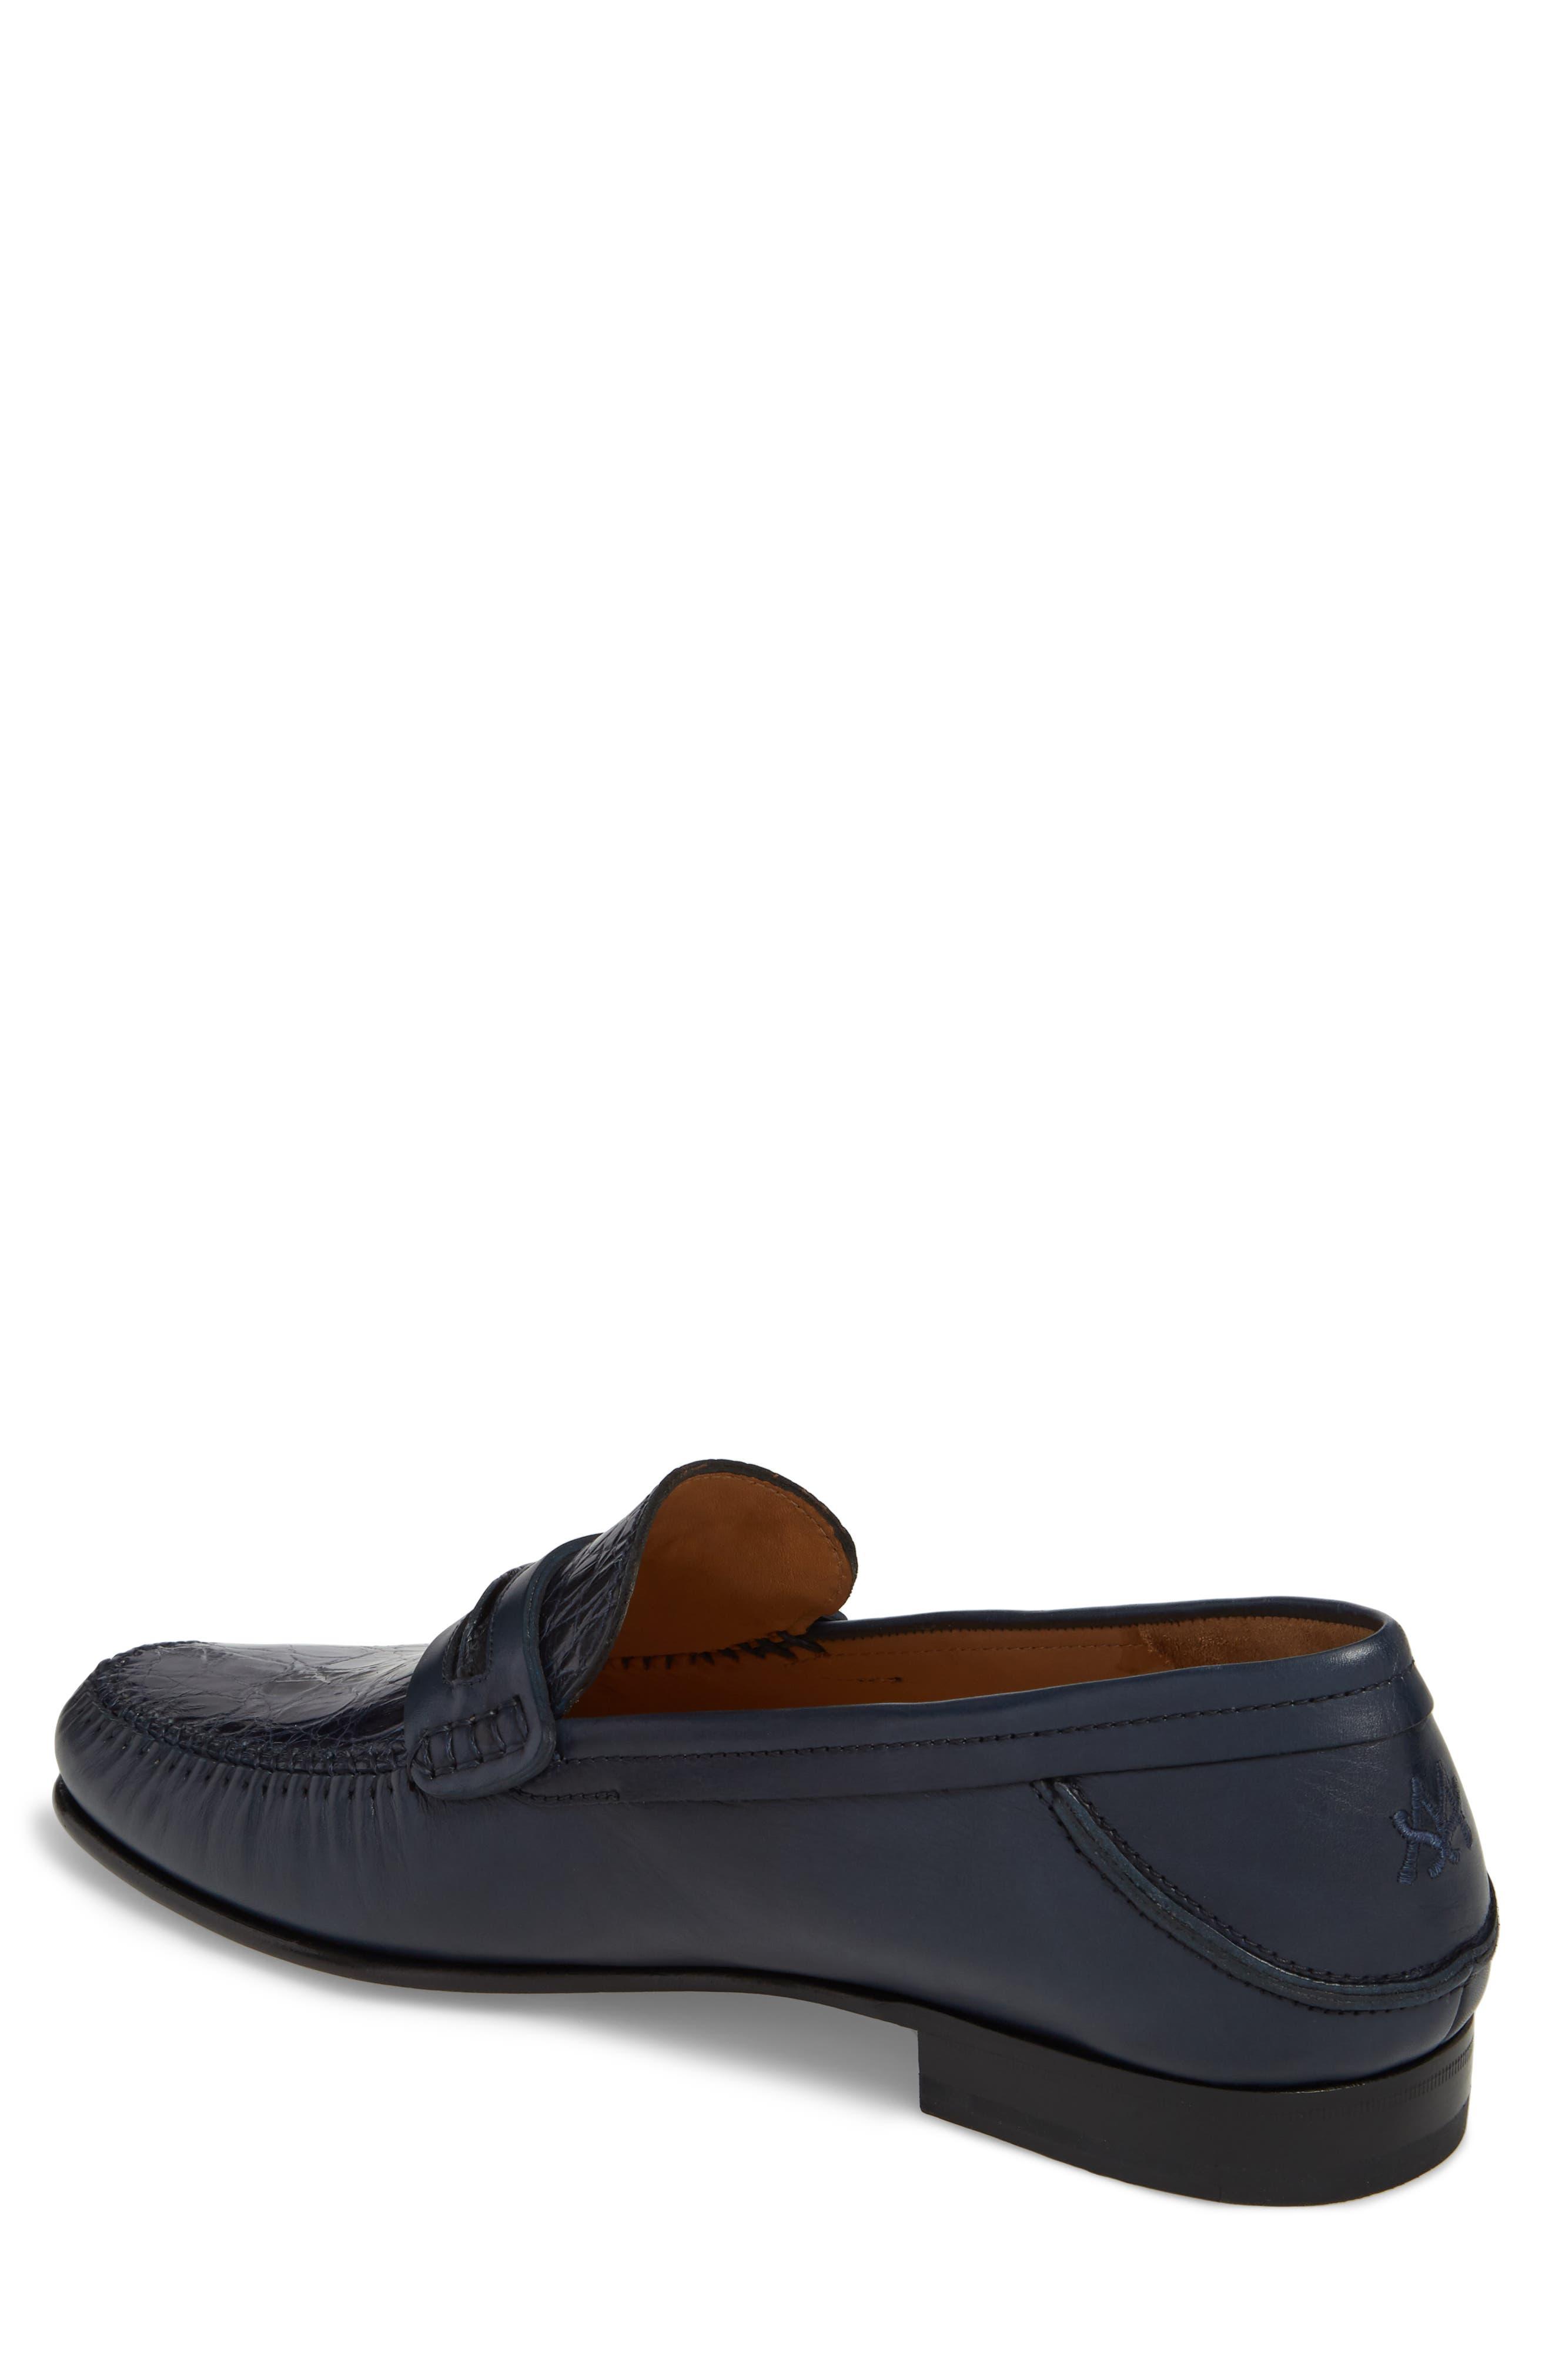 Kronos Moc Toe Penny Loafer,                             Alternate thumbnail 2, color,                             Blue Leather